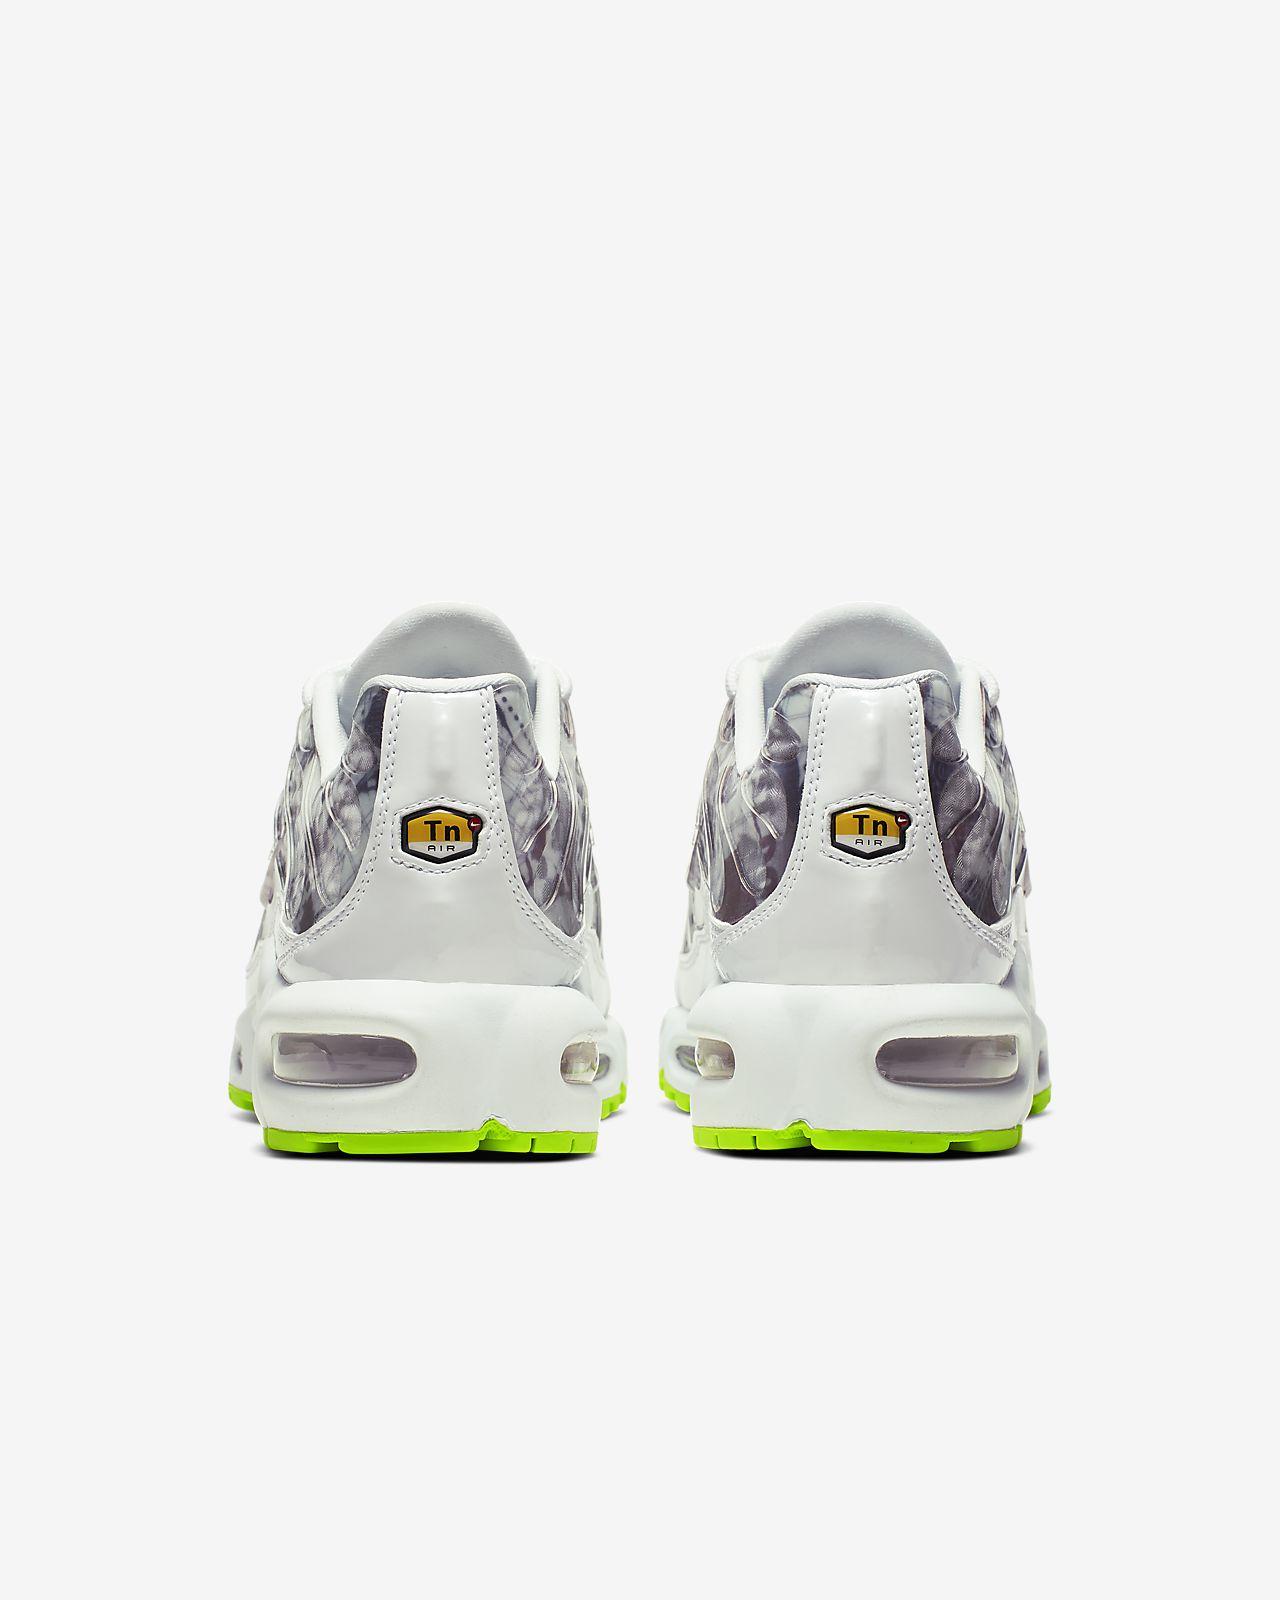 Nike Air Max Plus LX sko til kvinder